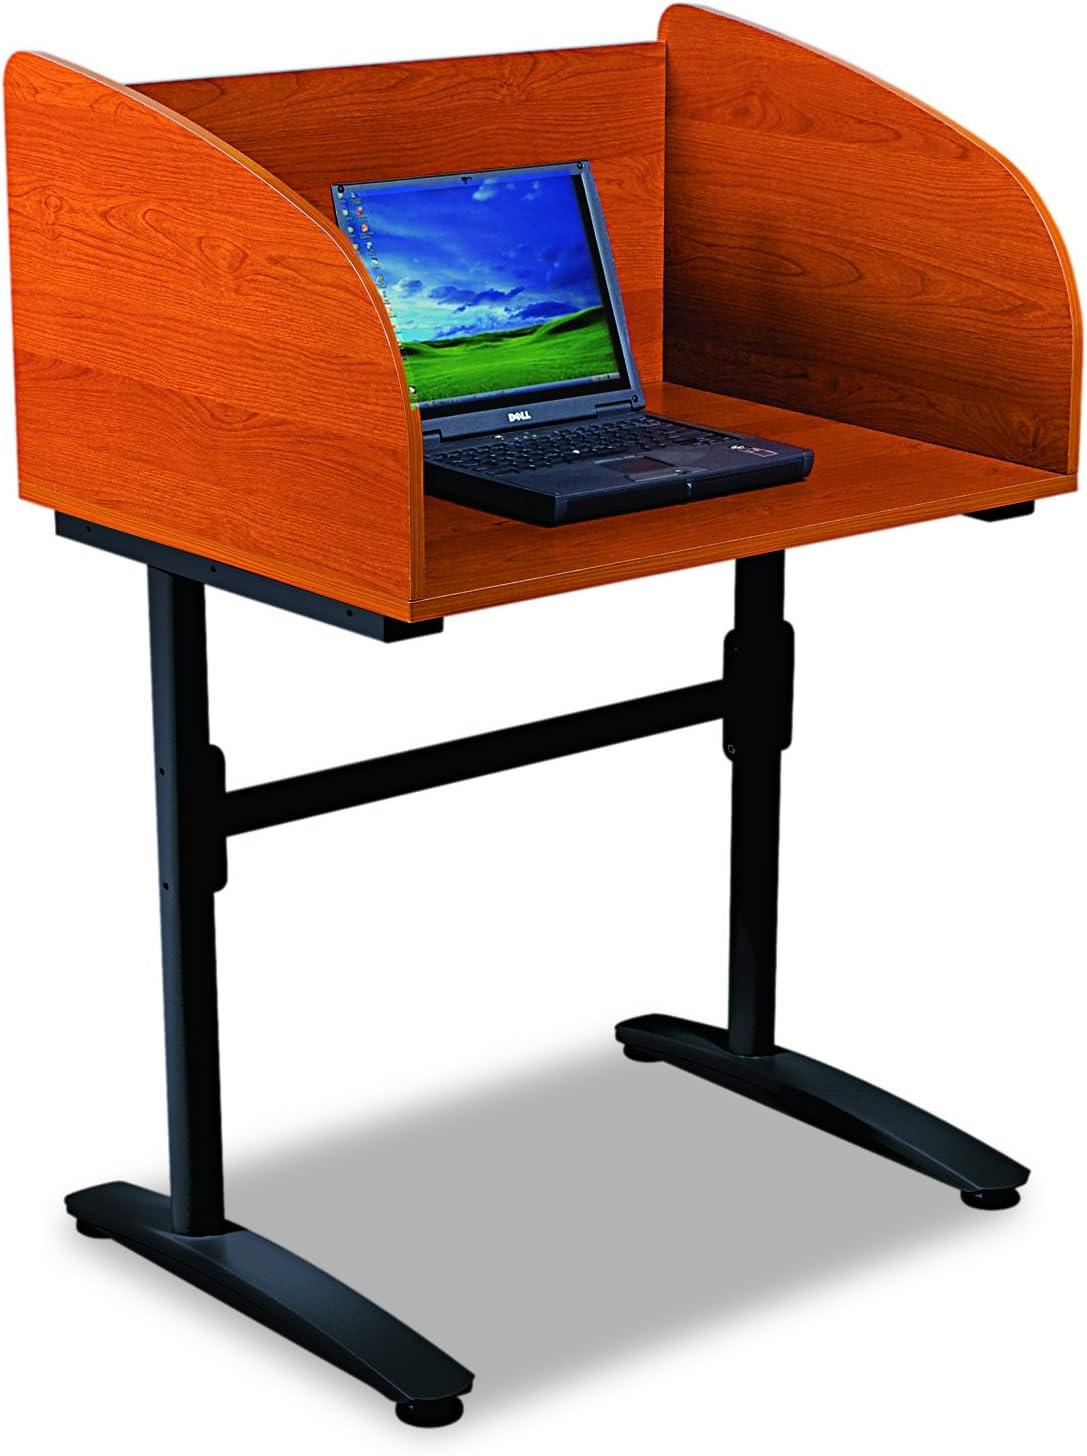 Balt Lumina Starter Carrel Privacy Workstation, Cherry/Black, 45.75